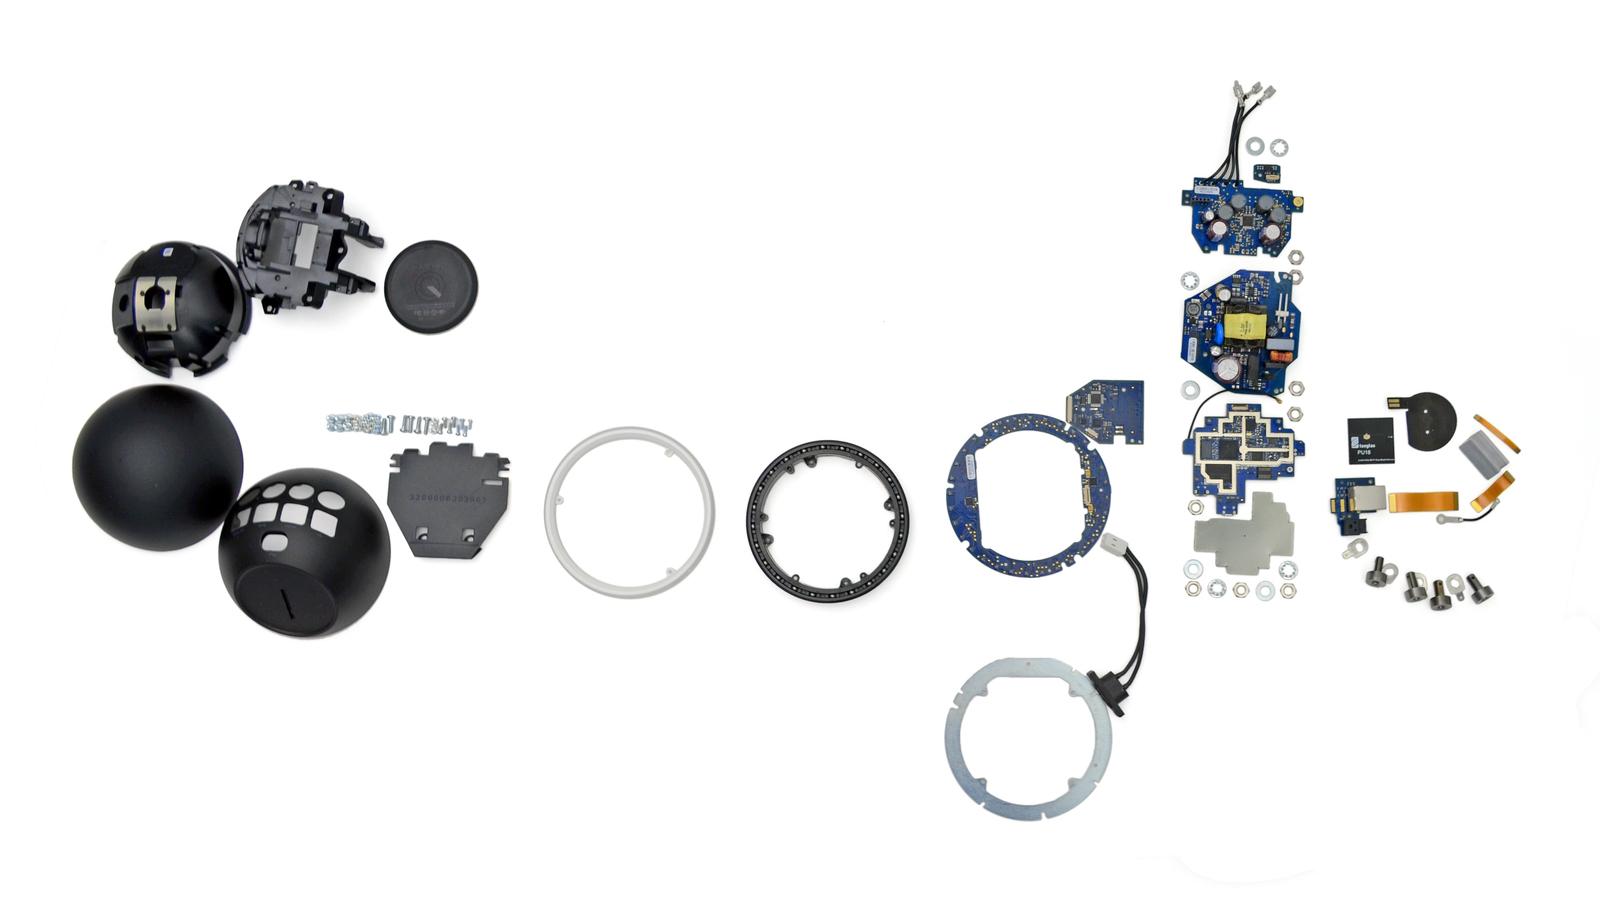 GOOGLE - Nexus Q desmontado